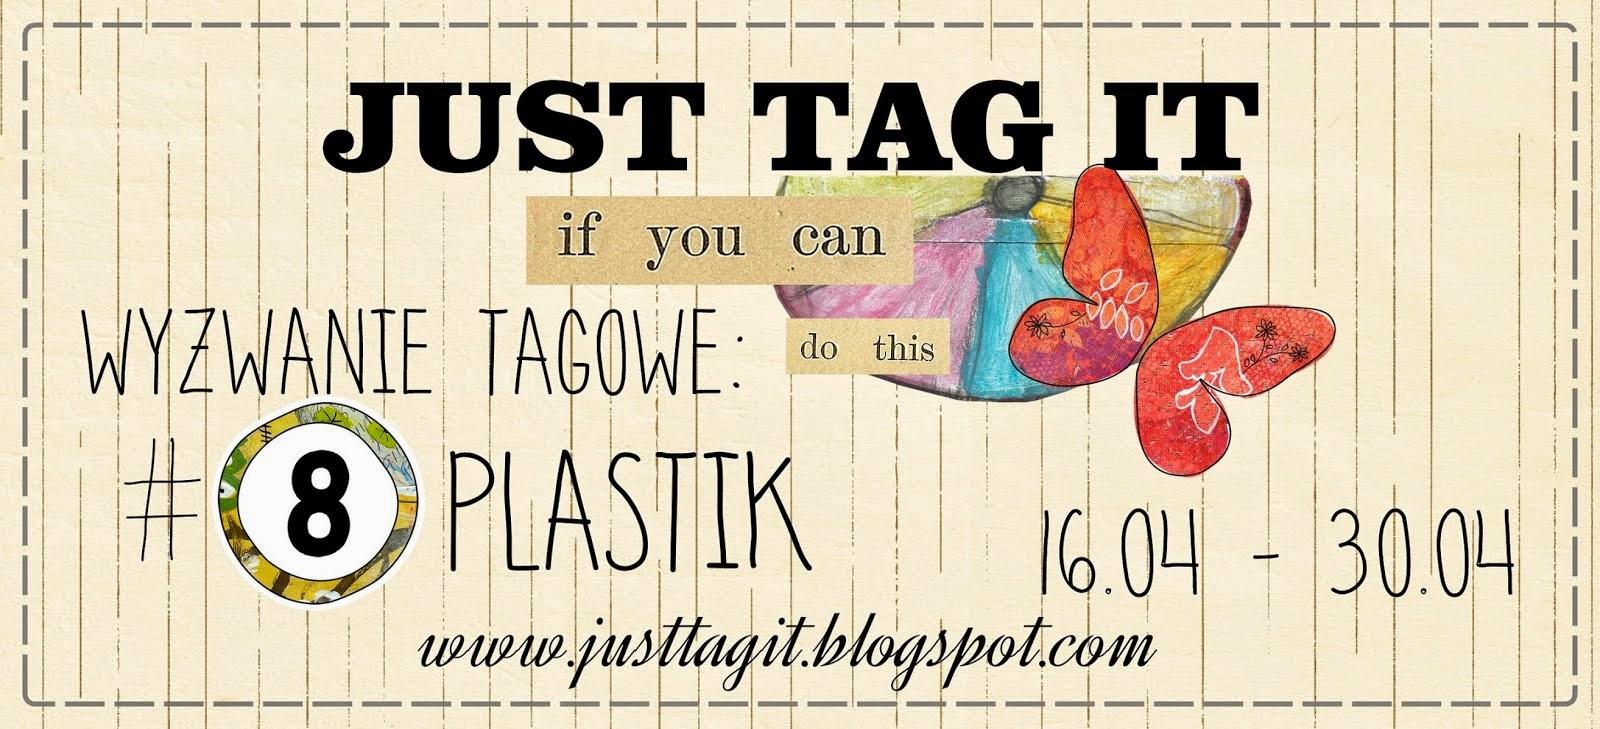 http://justtagit.blogspot.com/2015/04/wyzwanie-tagowe-8-plastik.html